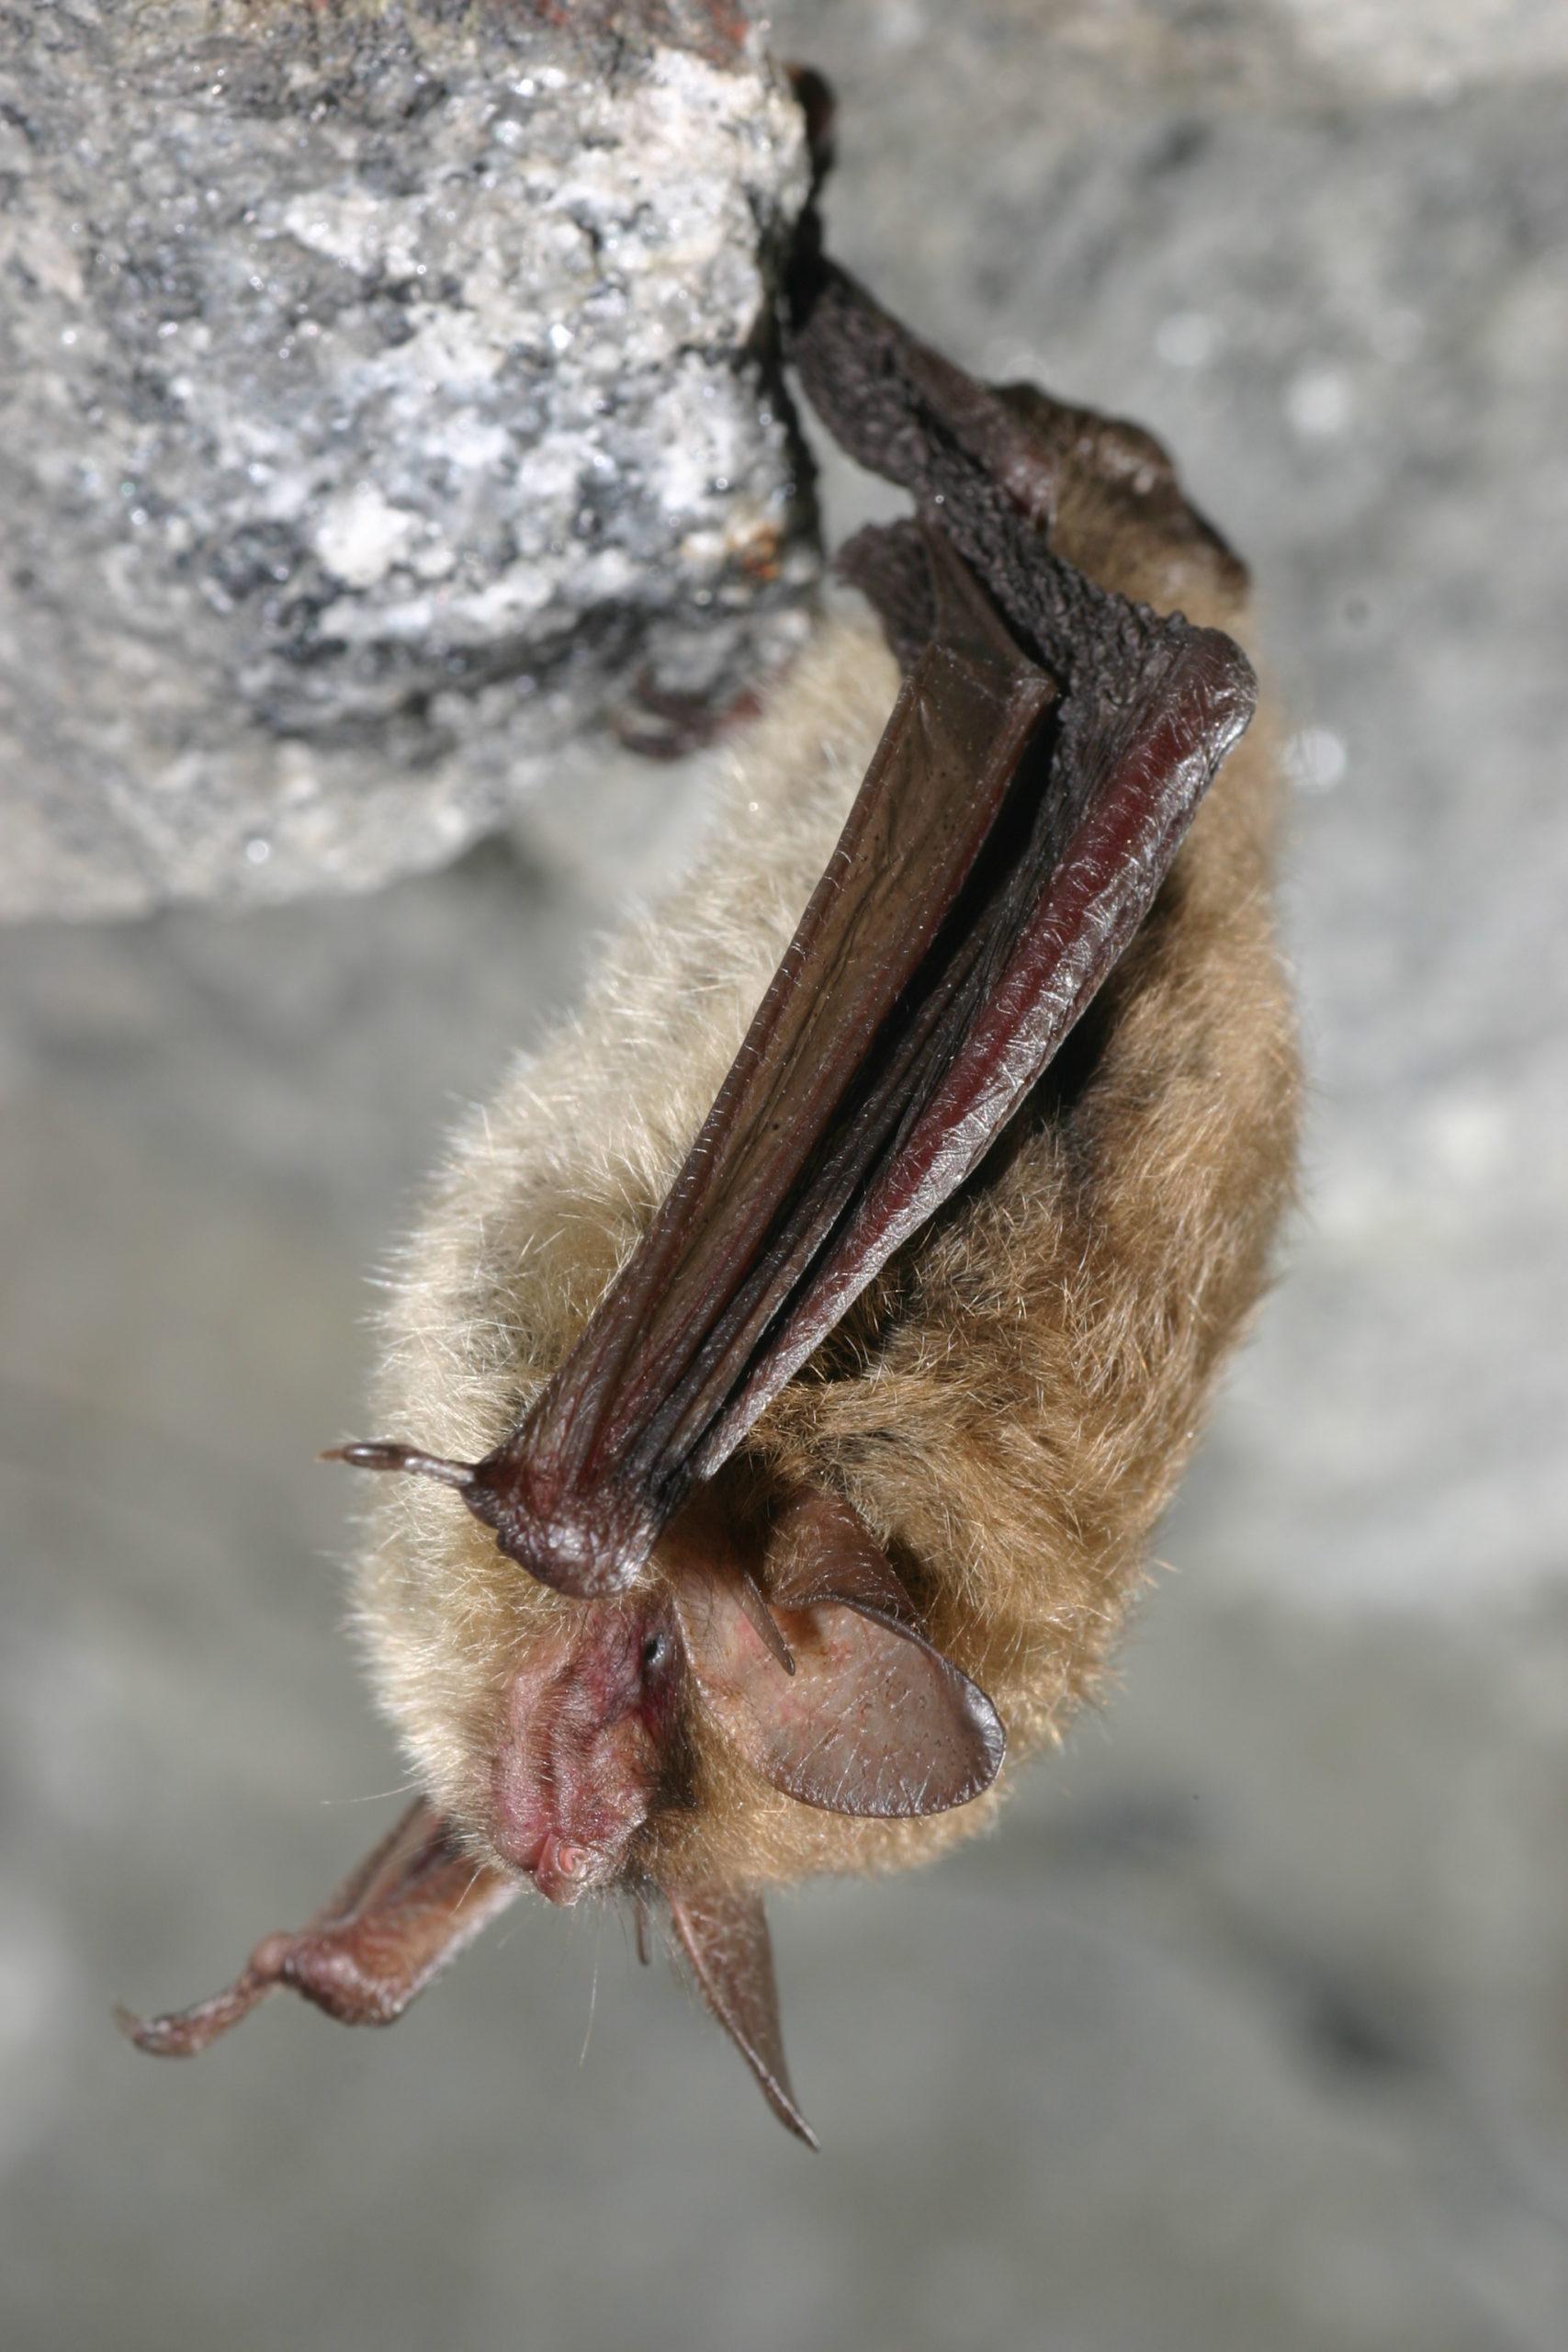 Northern long-eared bat in its hibernation spot.